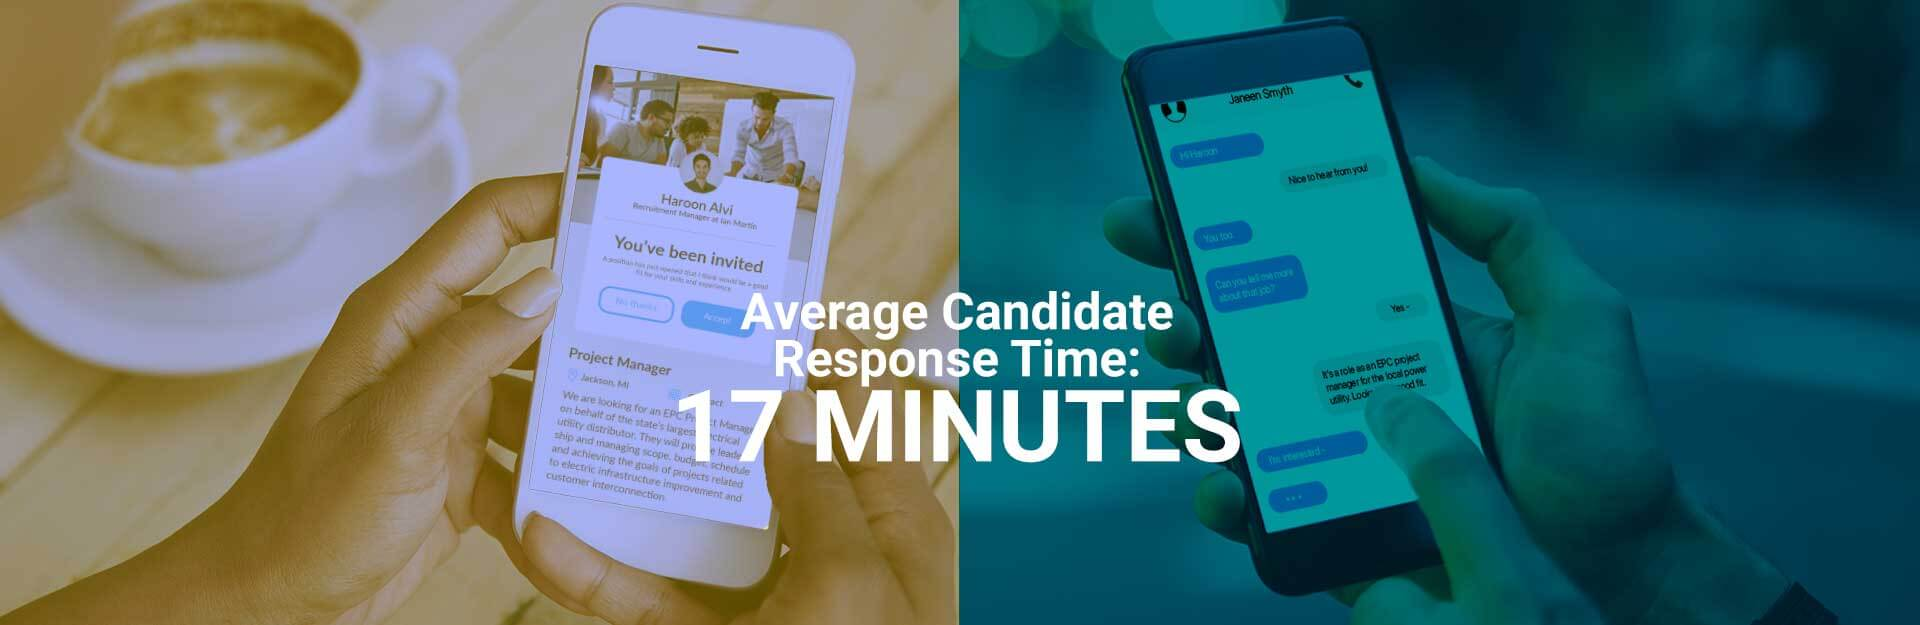 Average response time of 17 minutes